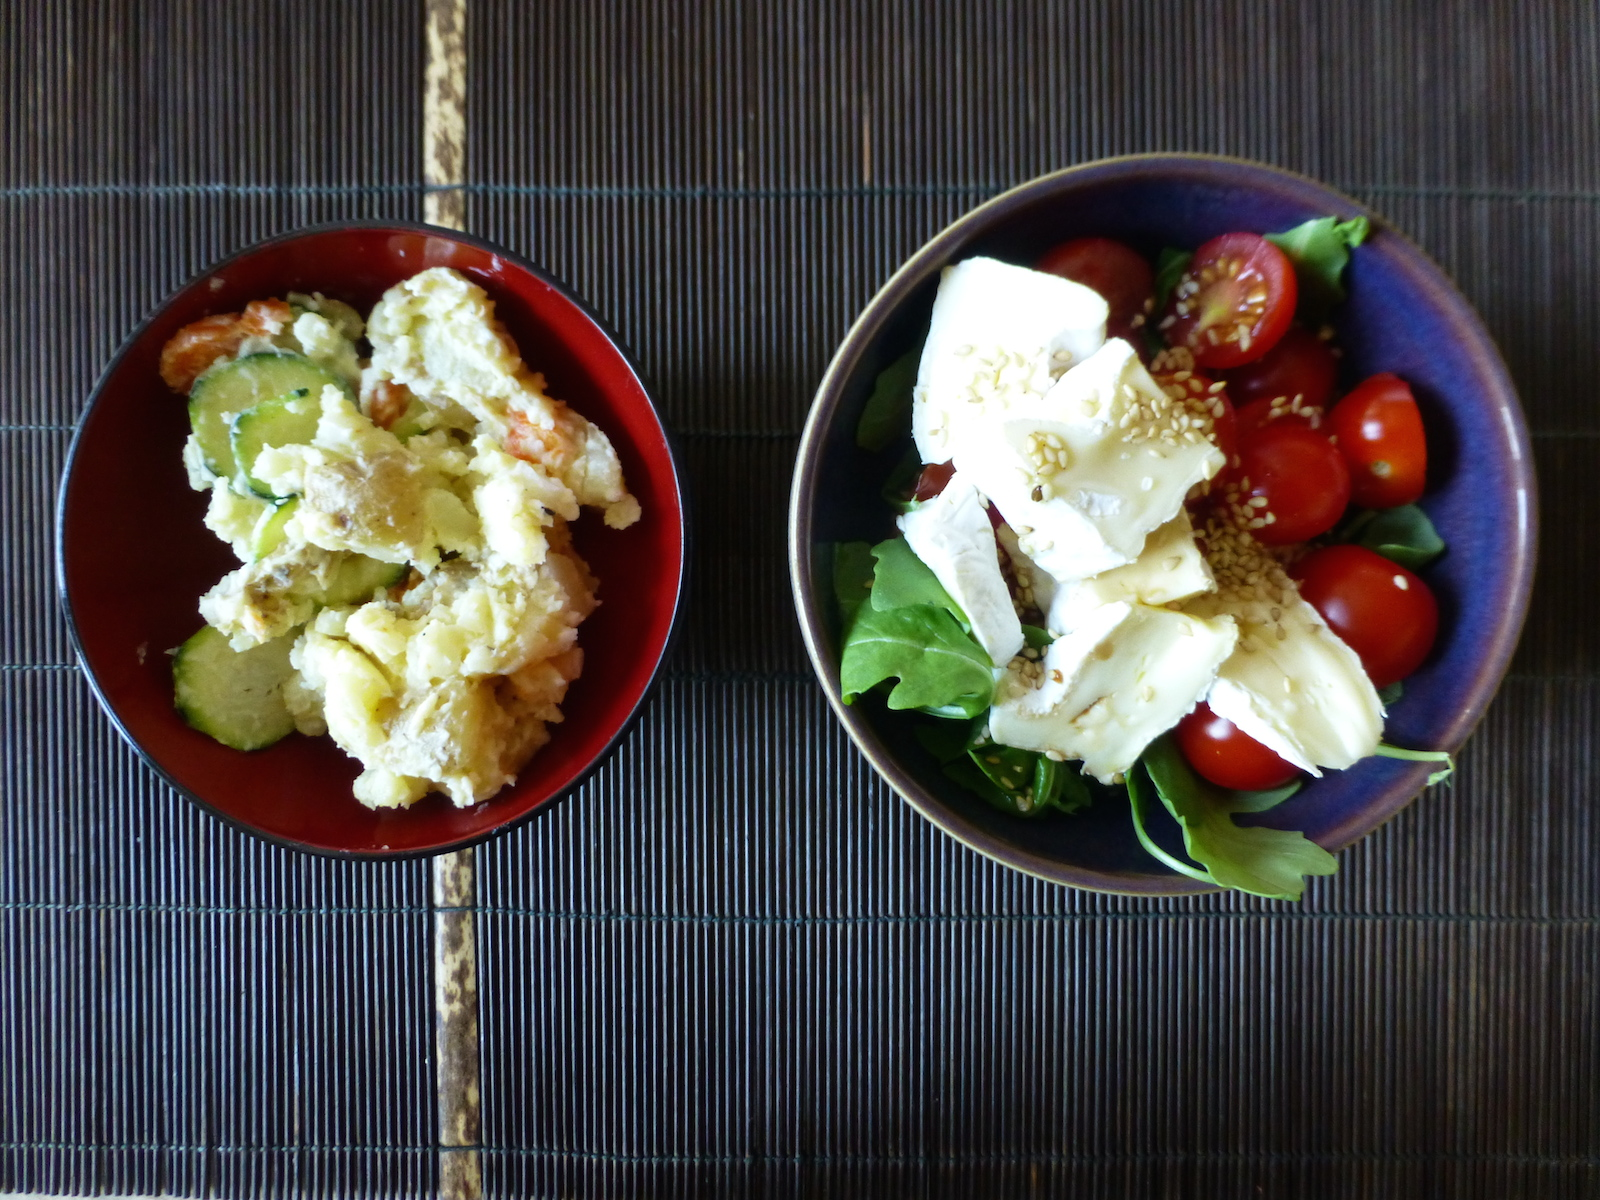 Japanese-style potato salad